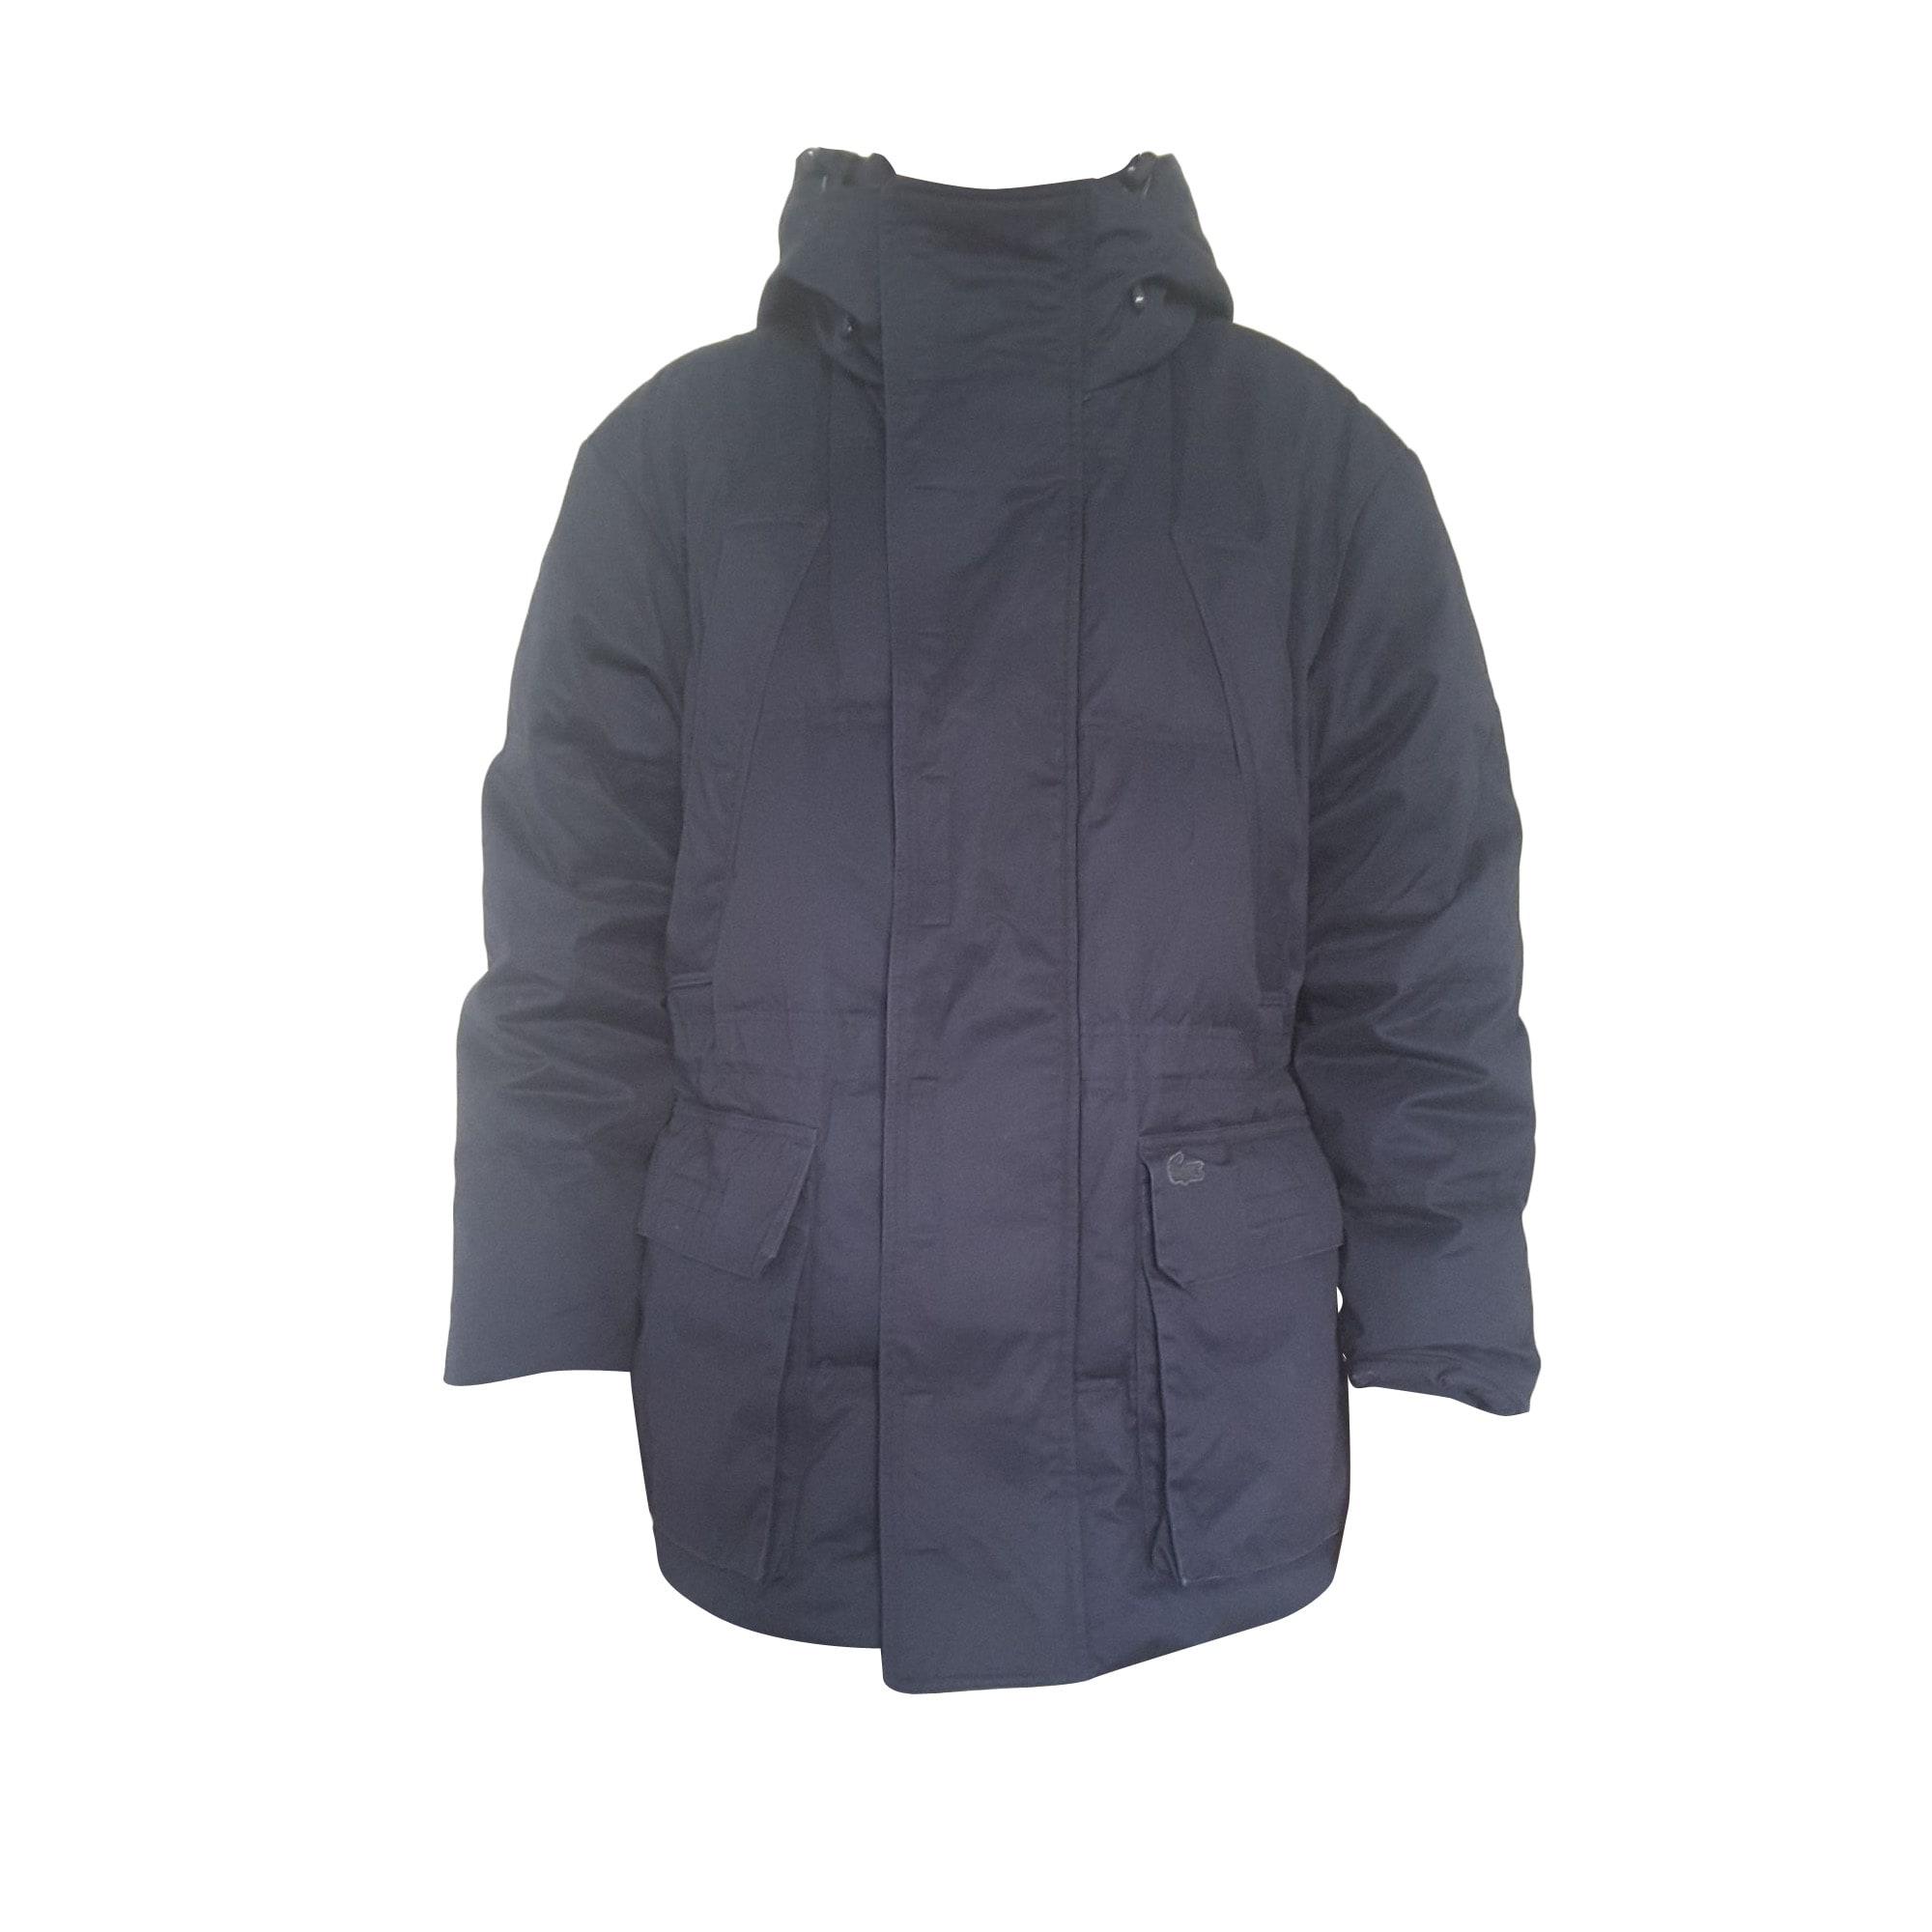 dce3850ee42 Parka LACOSTE 58 (XL) bleu - 8236760